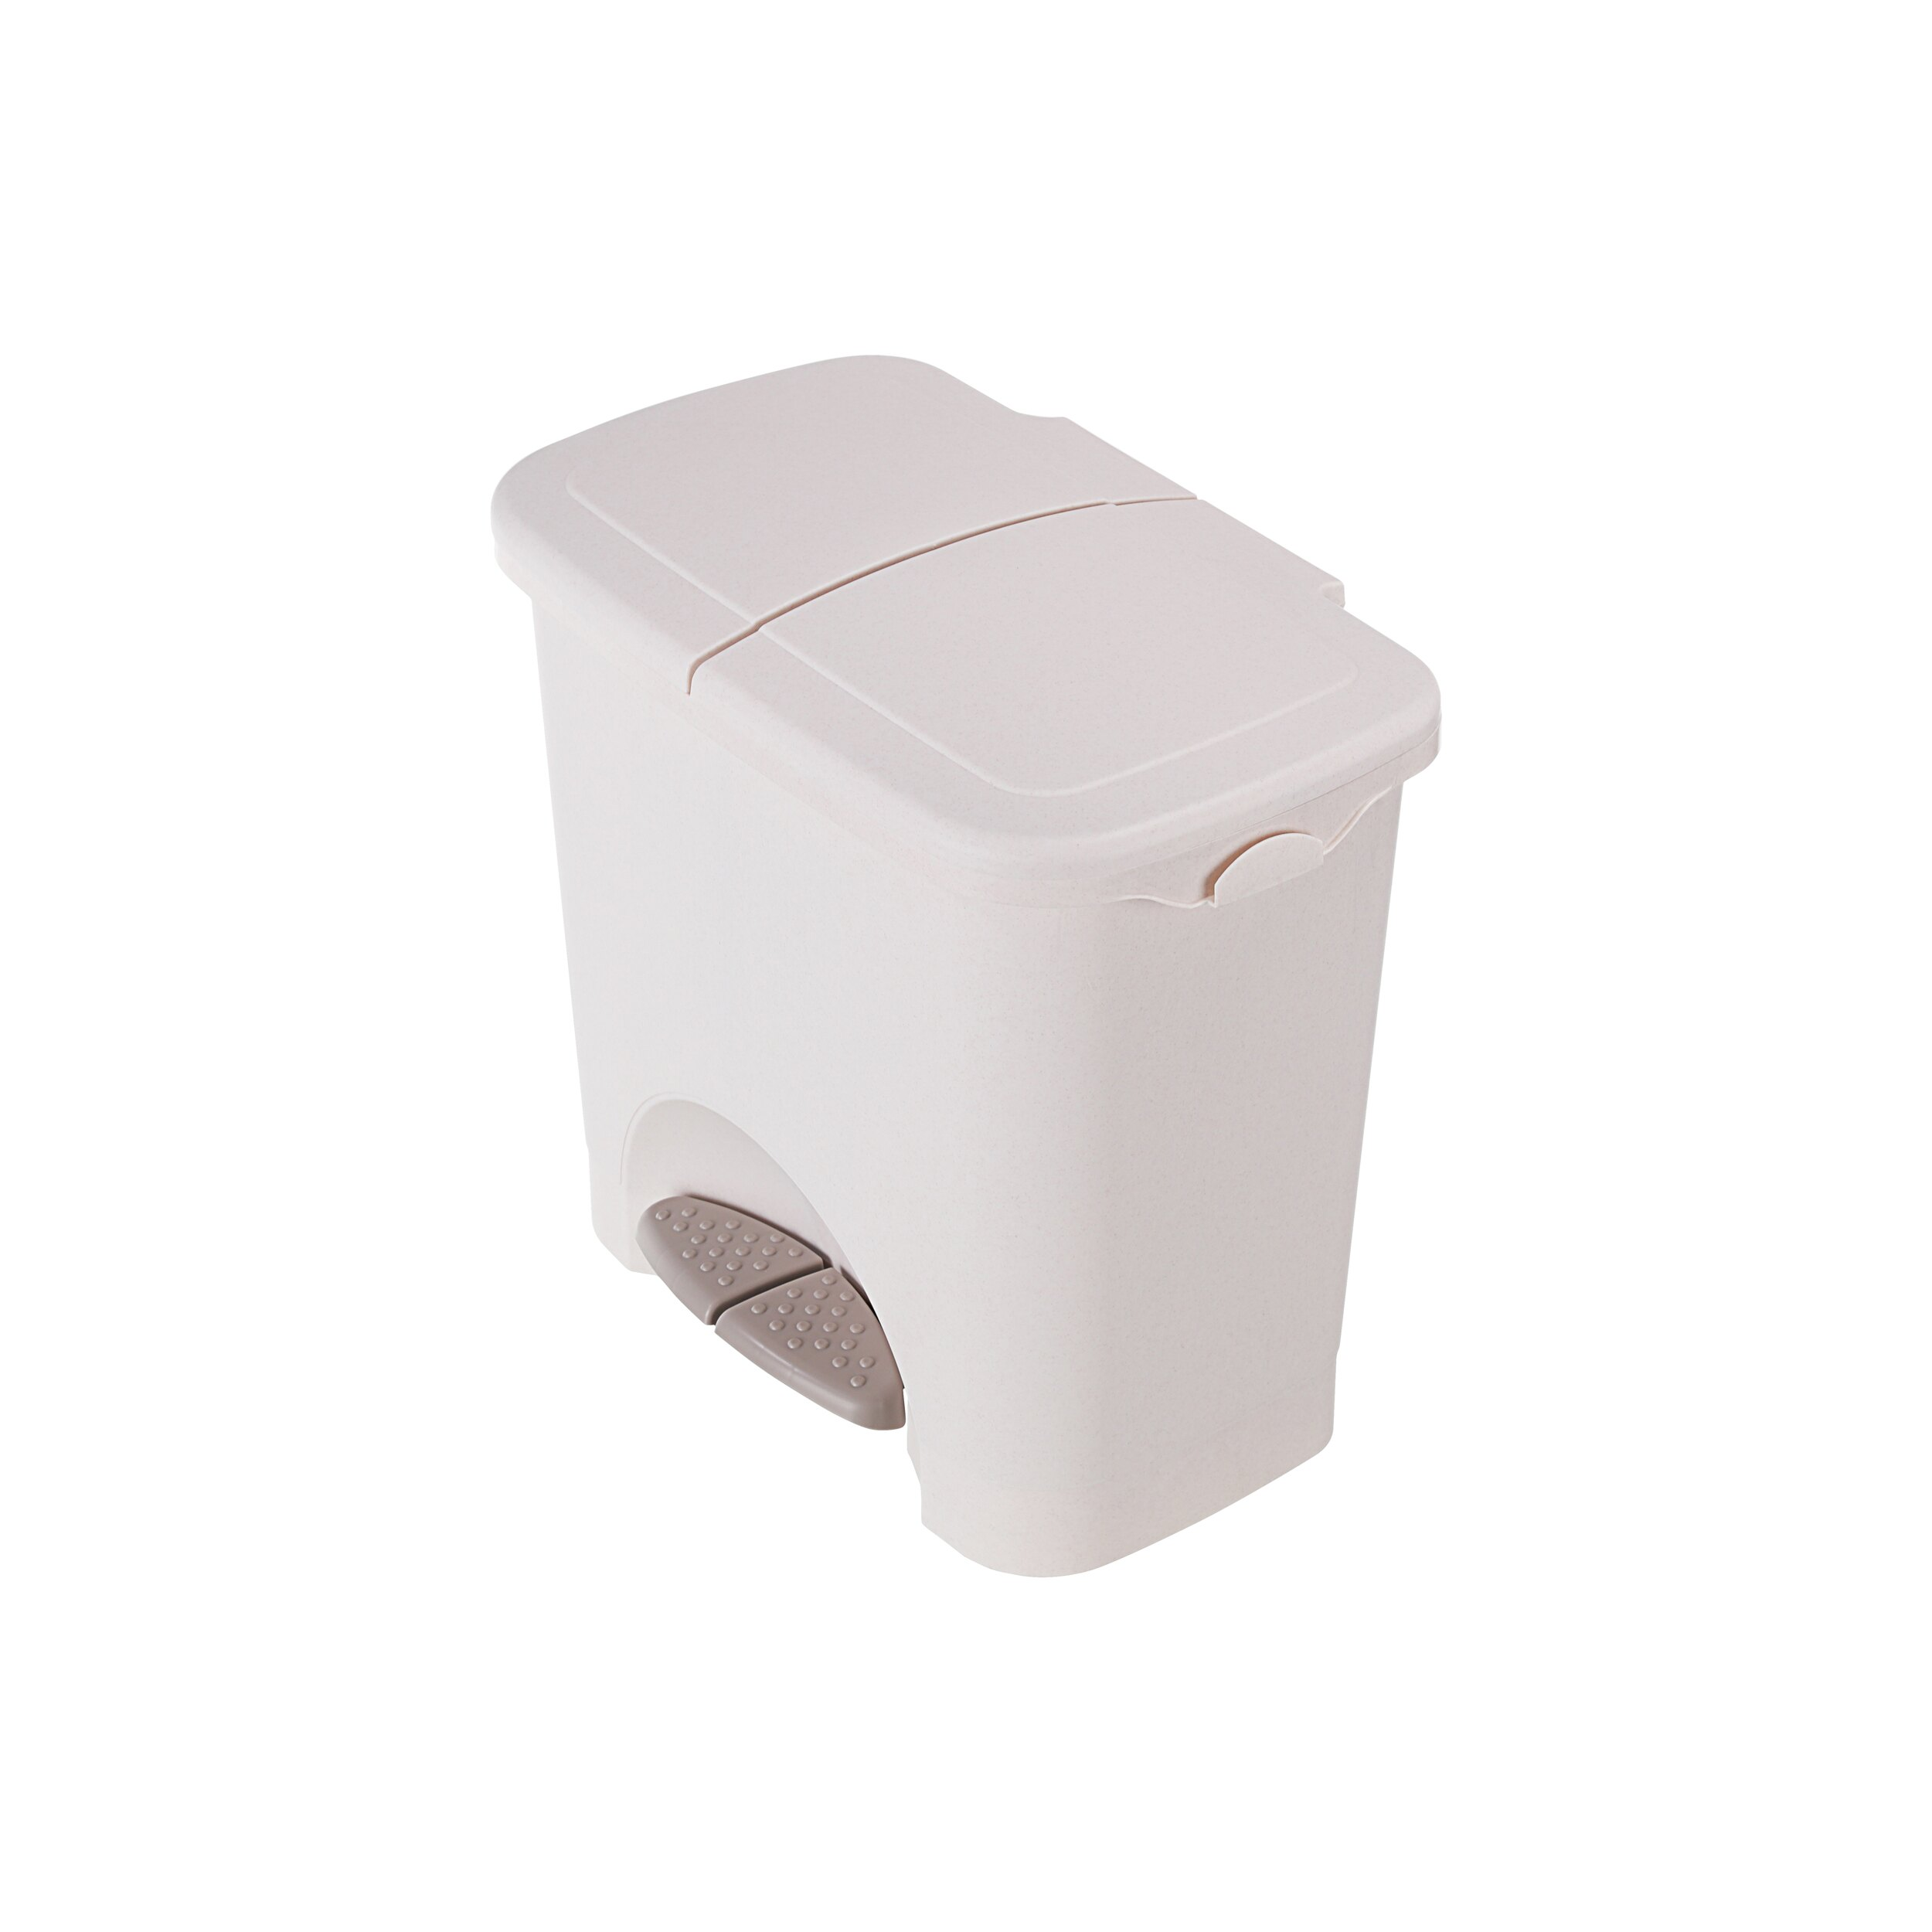 KEYWAY聯府 MIT 30L環保四分類垃圾桶CW30 2